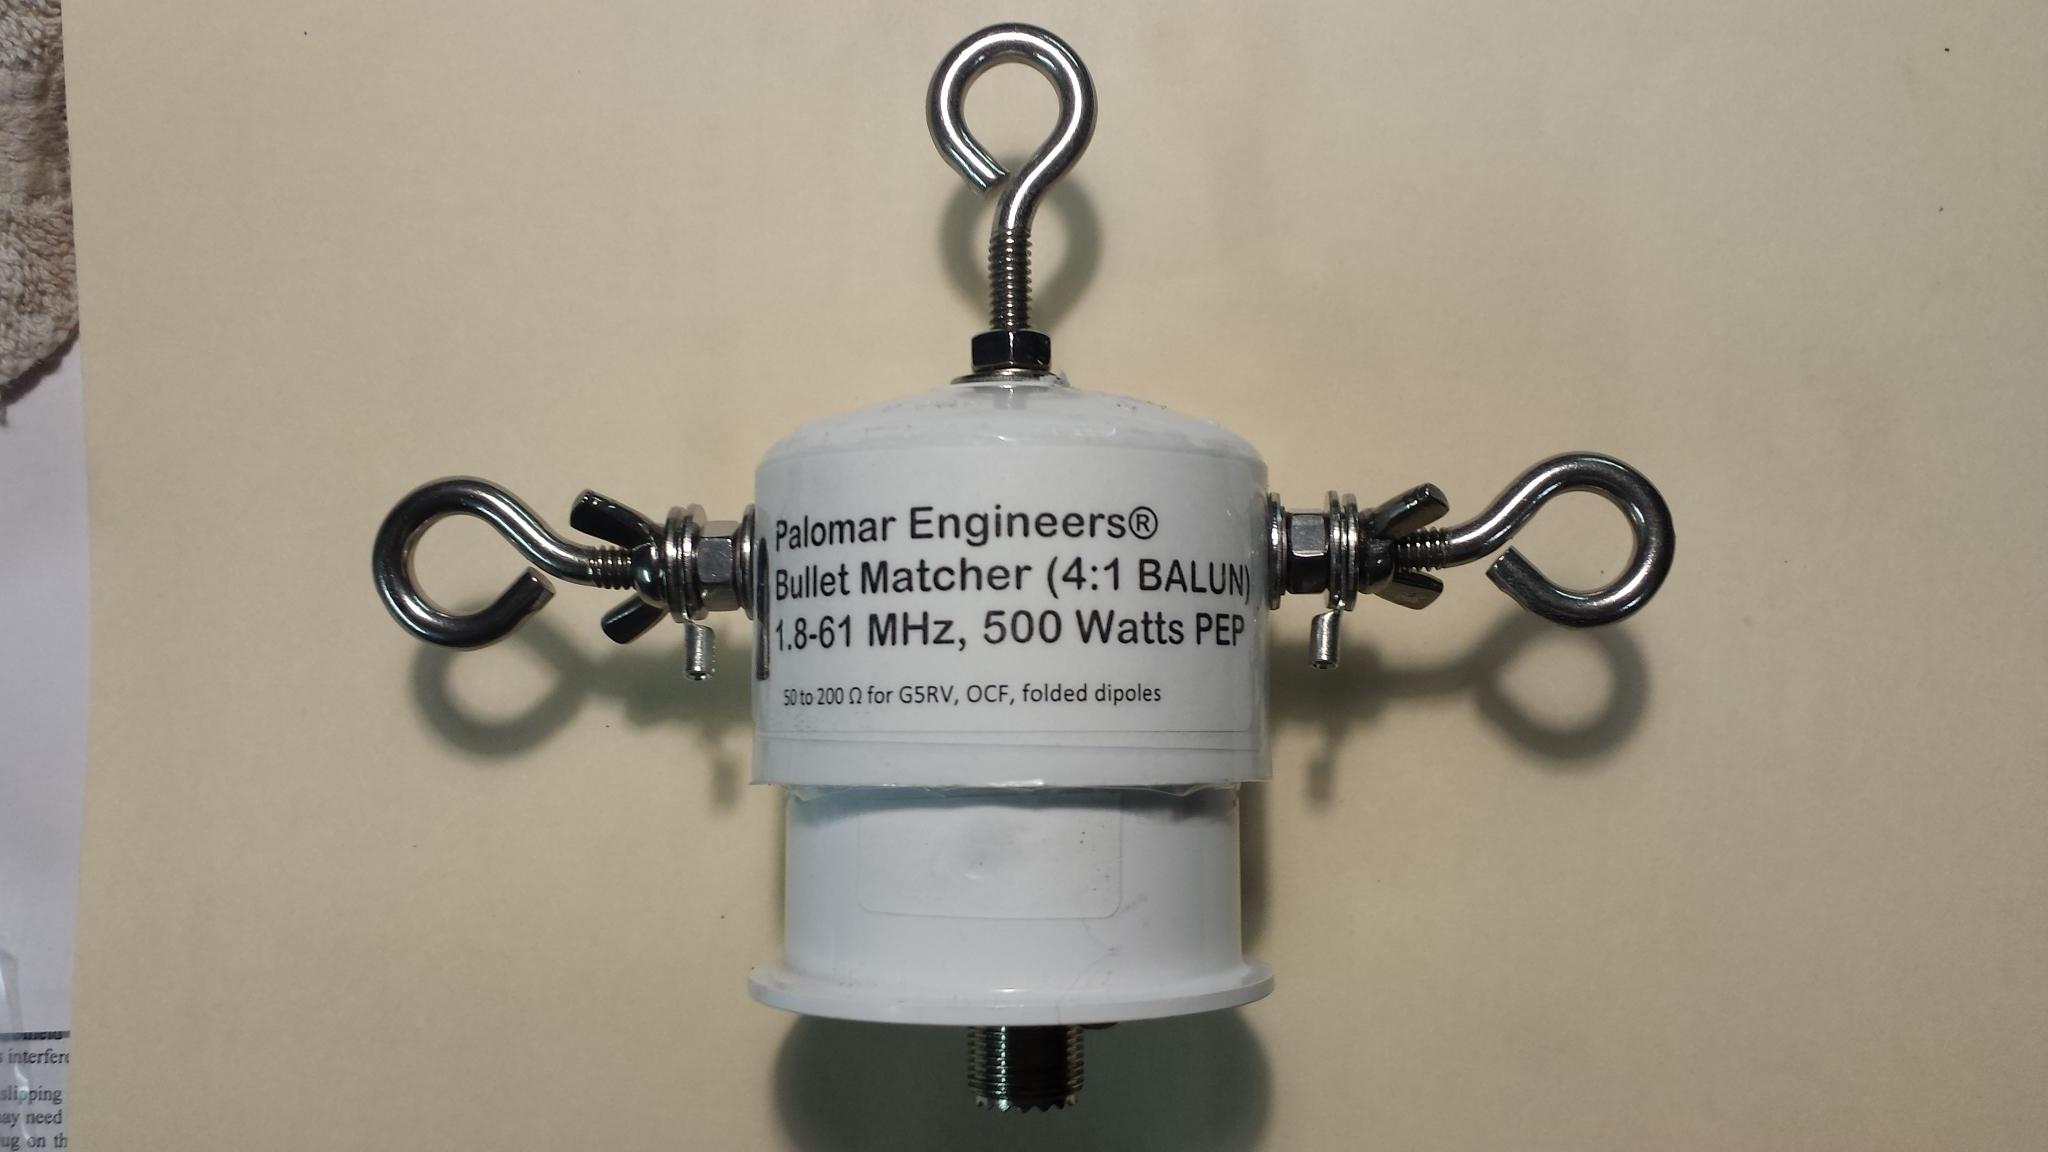 Bullet 50:200 (4:1) HF Balun, 1.8-61 MHz, 500 Watts PEP, Loop, OCF, ZEPP Bullet-4B